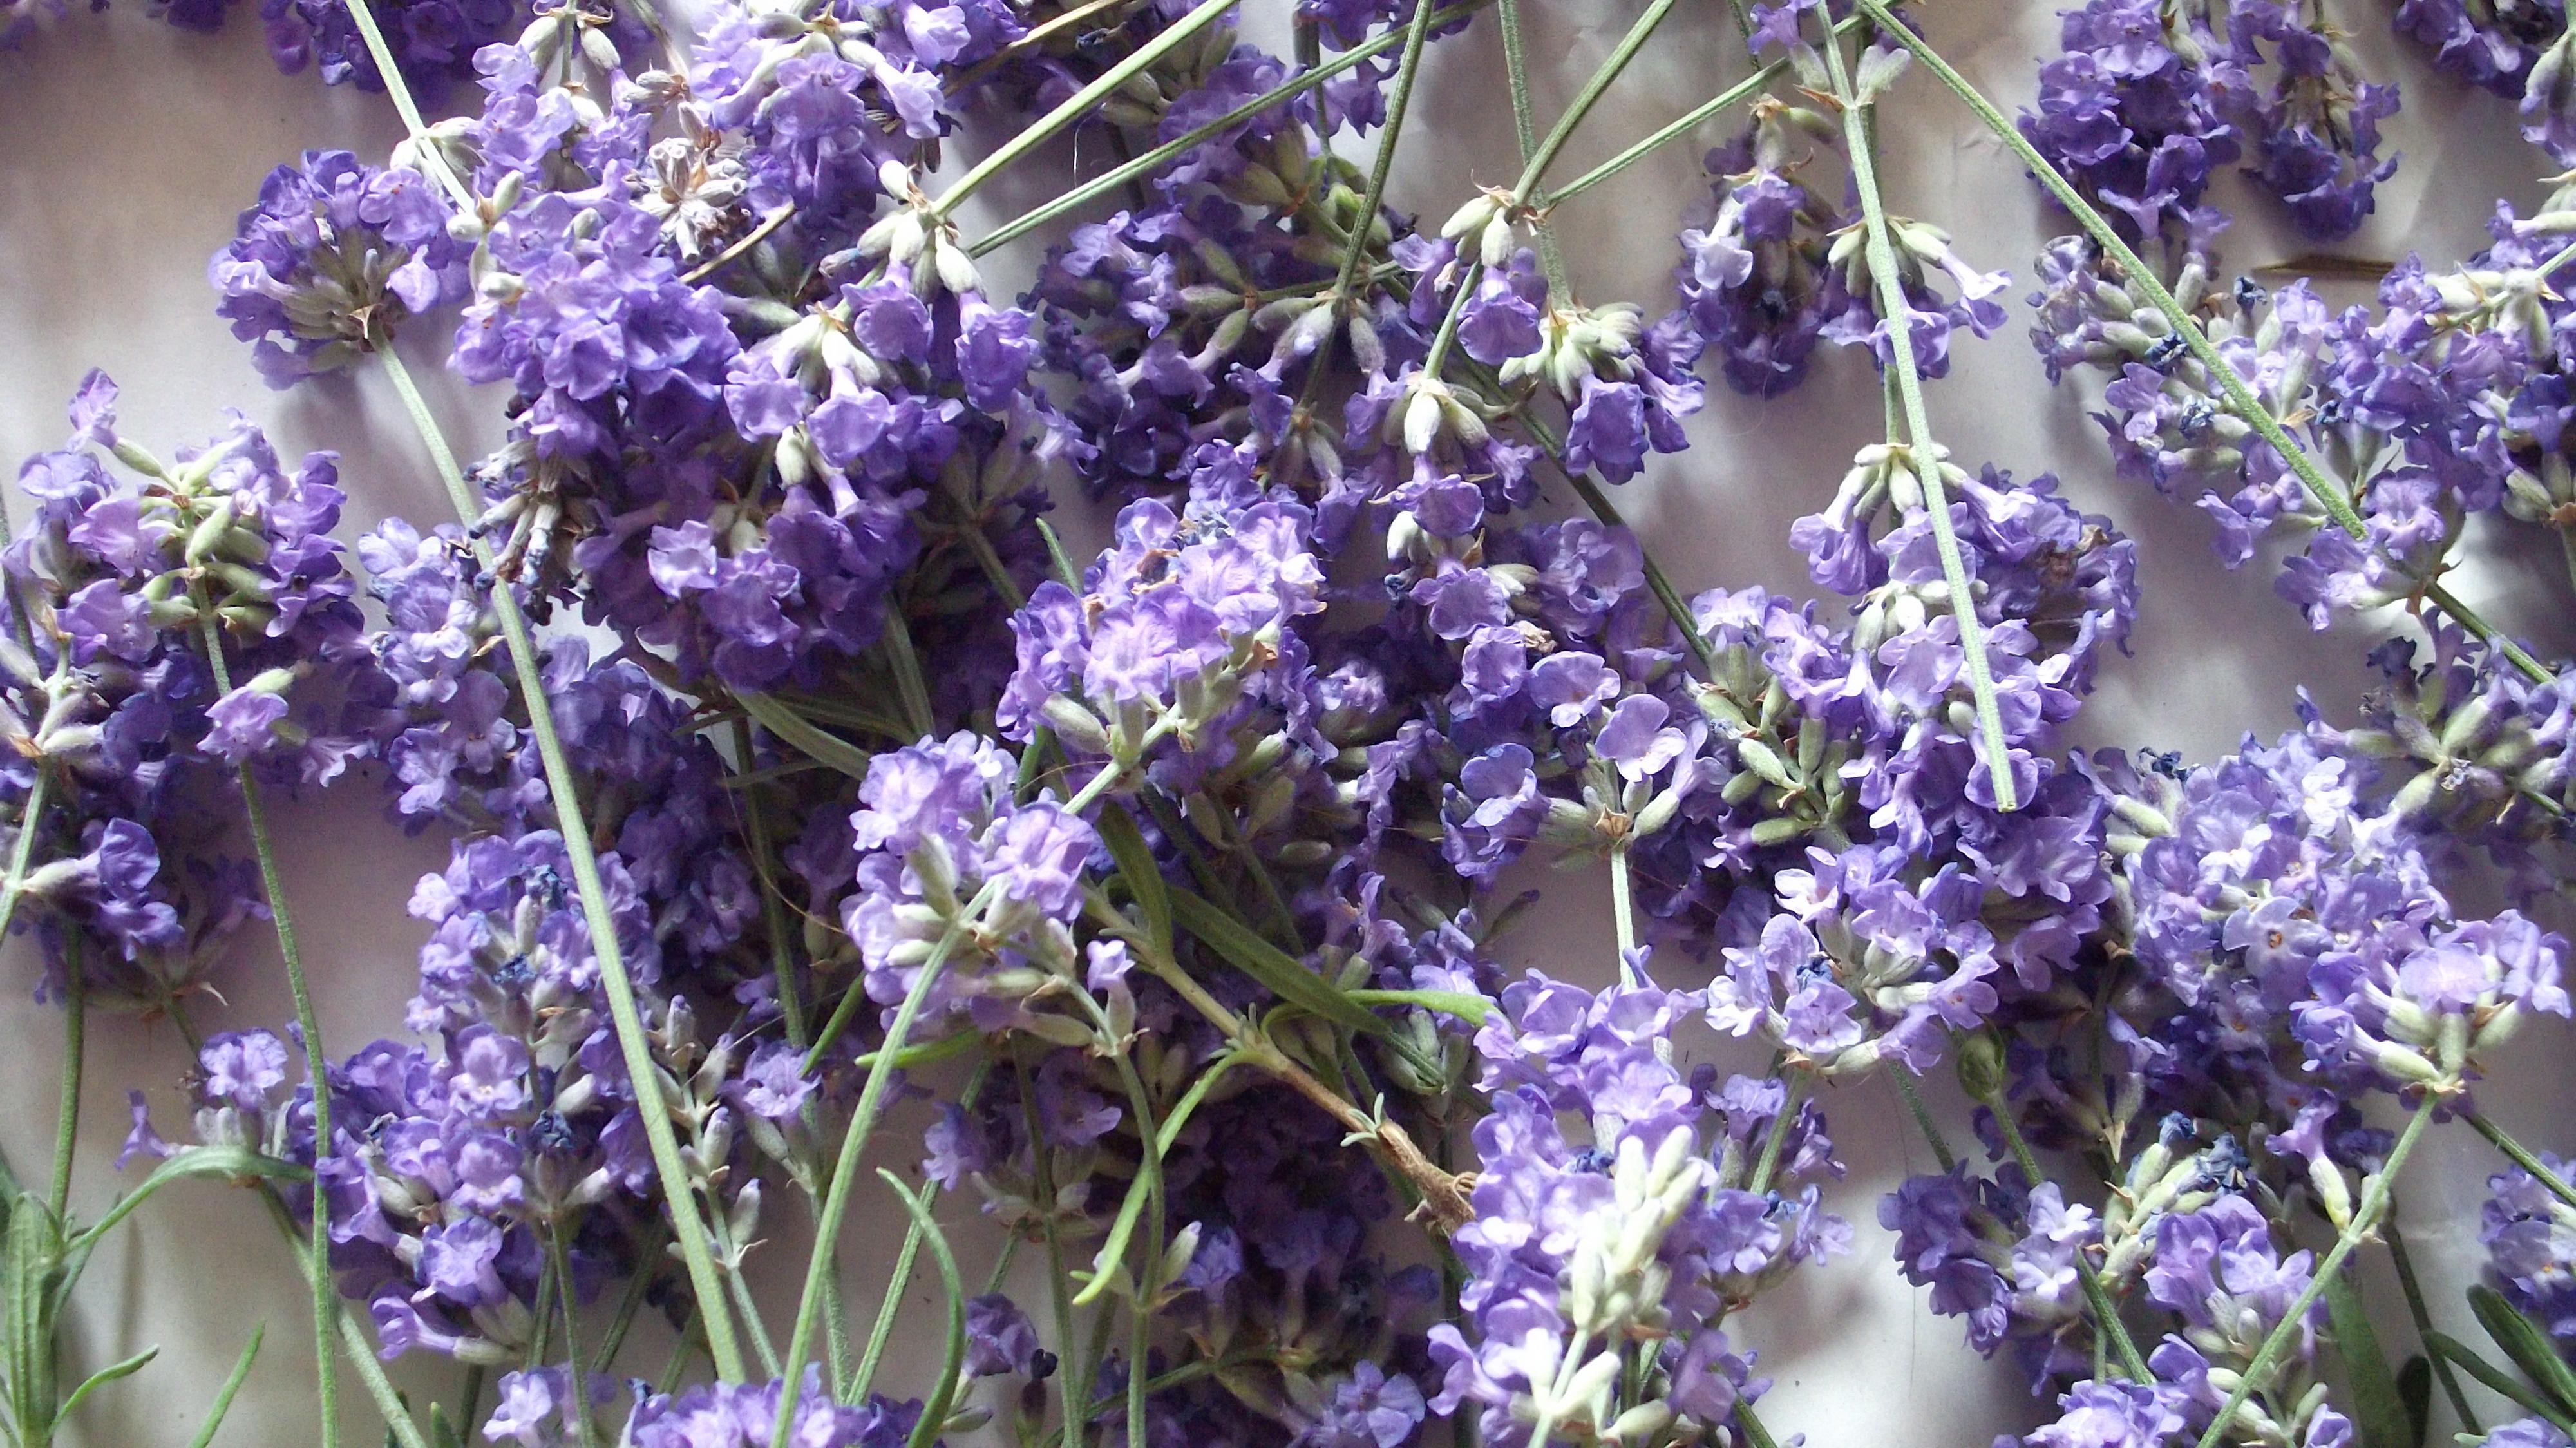 Http Karonv Wordpress Com 2011 07 07 Lavender Recipes For Beauty